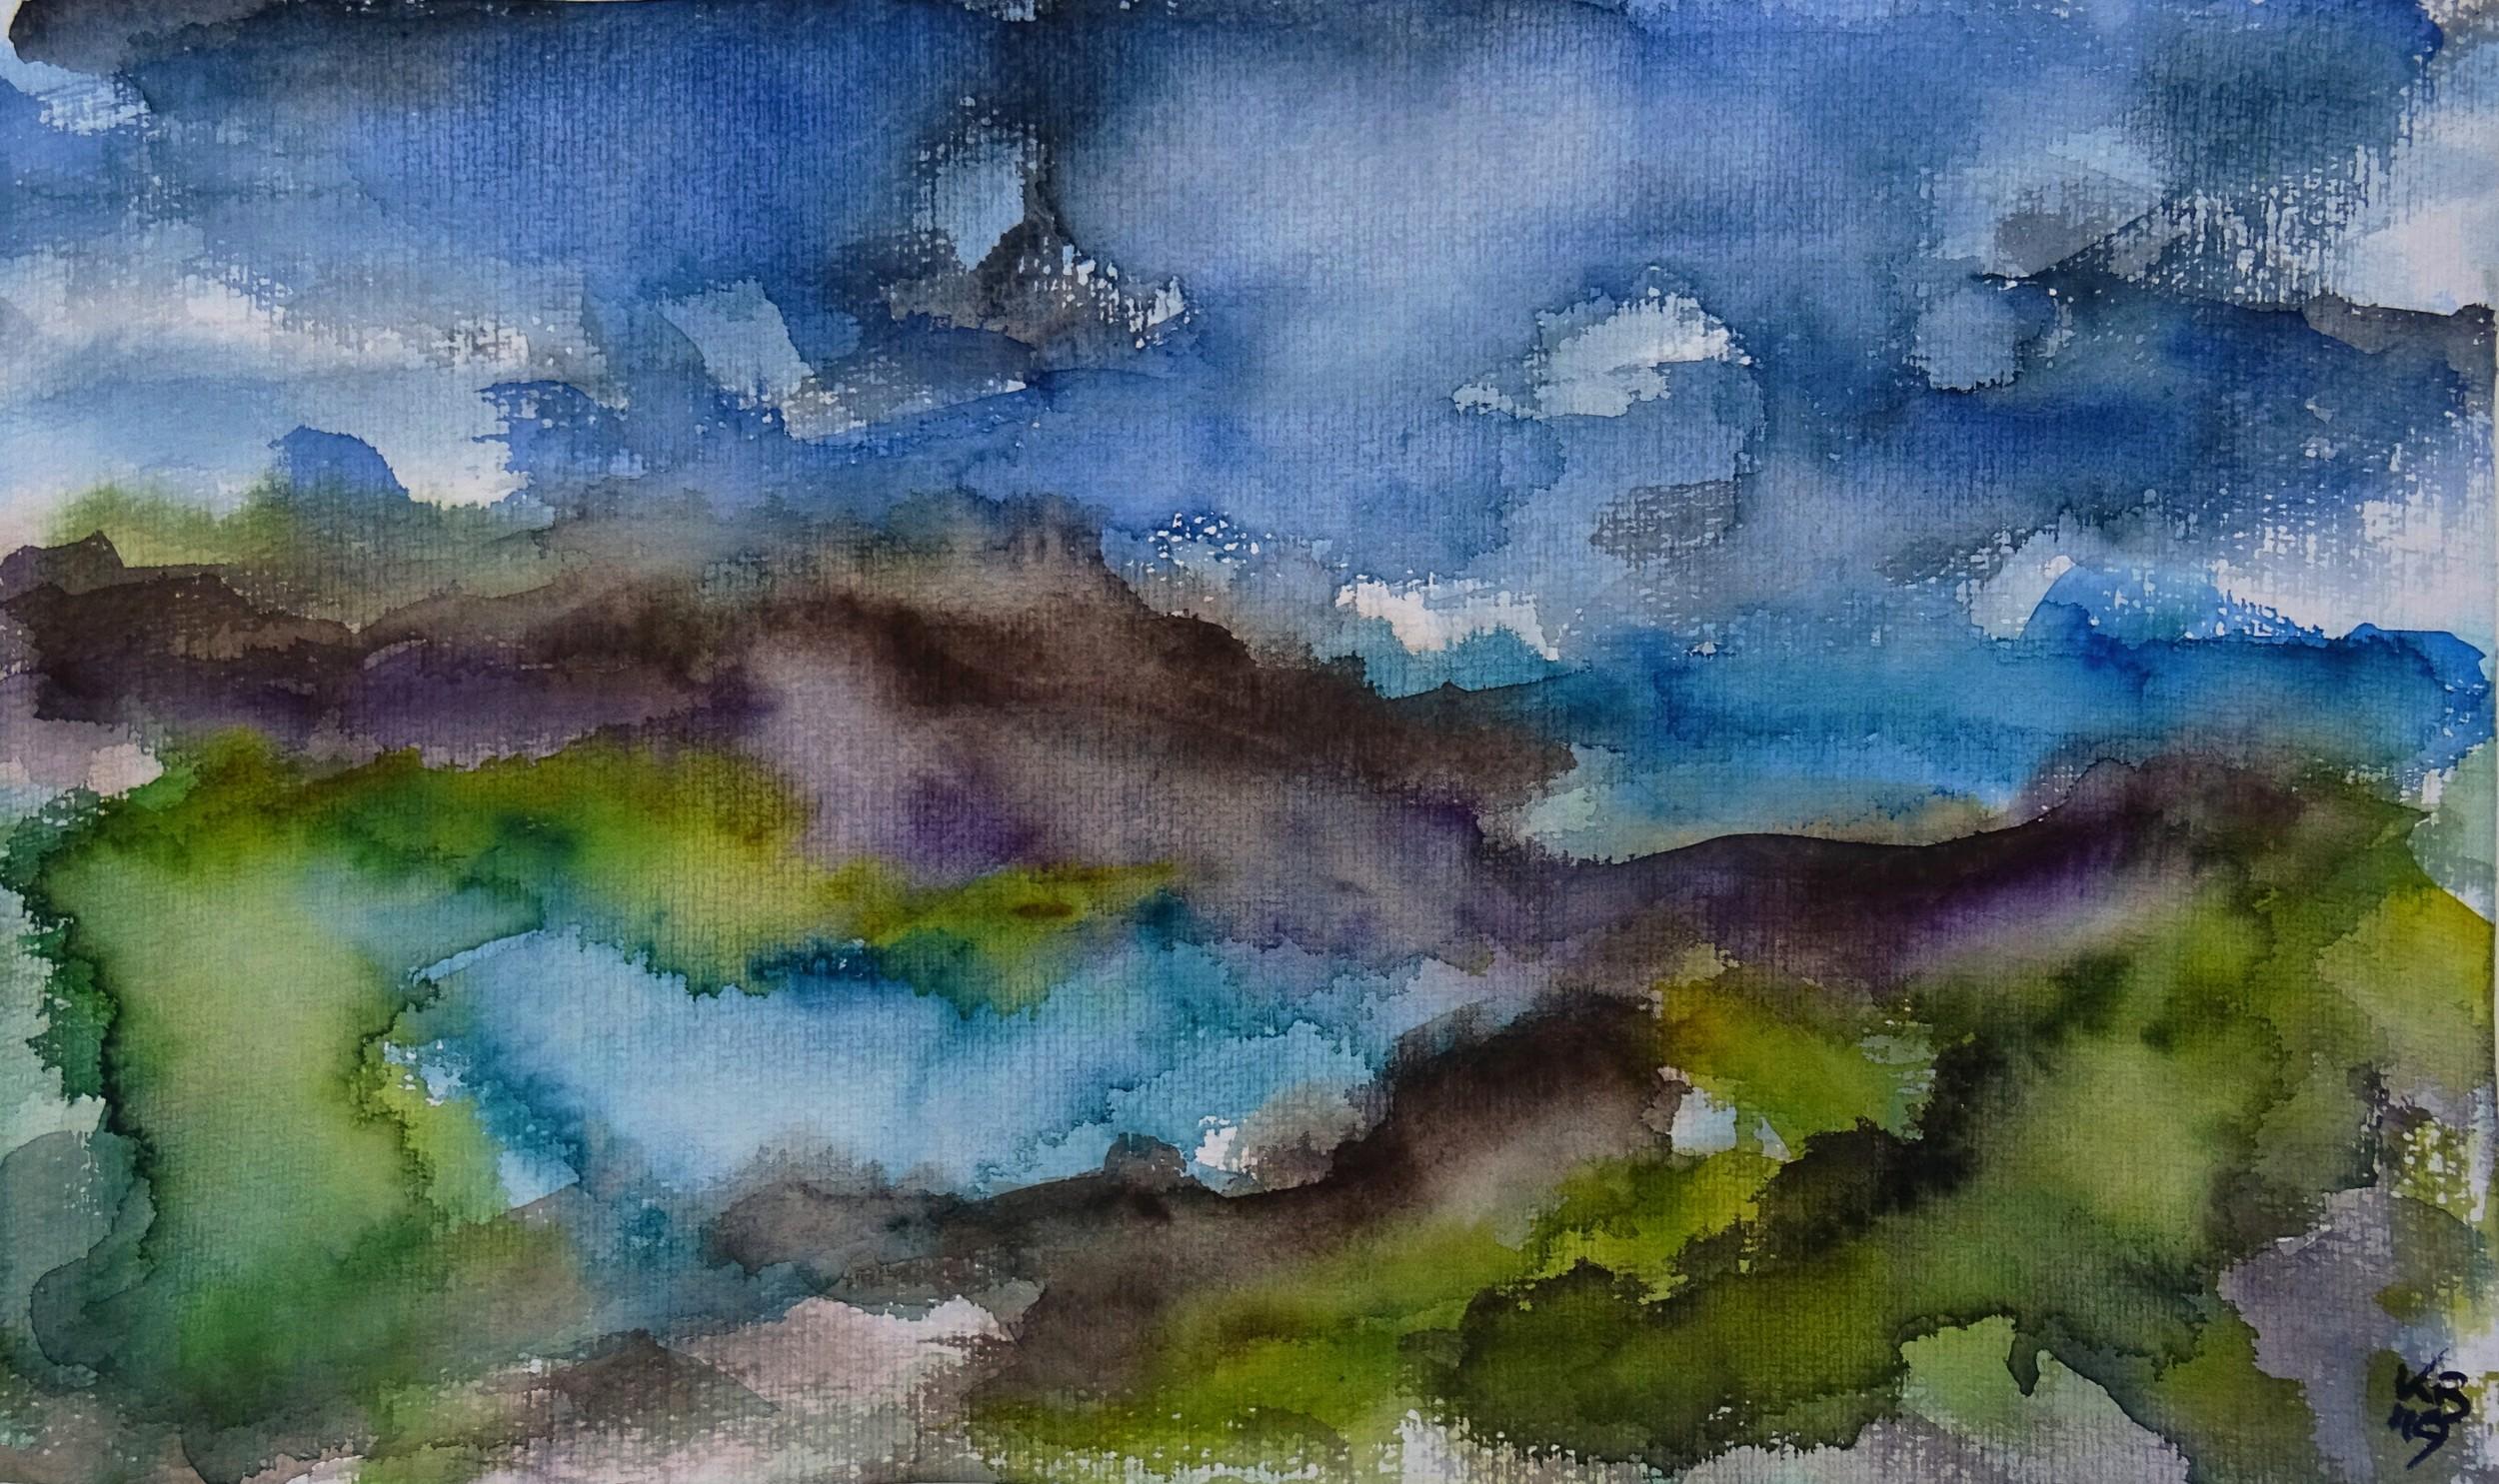 19-02-05_outer_hebrides_harris_loch_fhleoideabhaigh_Watercolour_50_x_30_cm_©2019_by_Klaus_Bölling.jpg